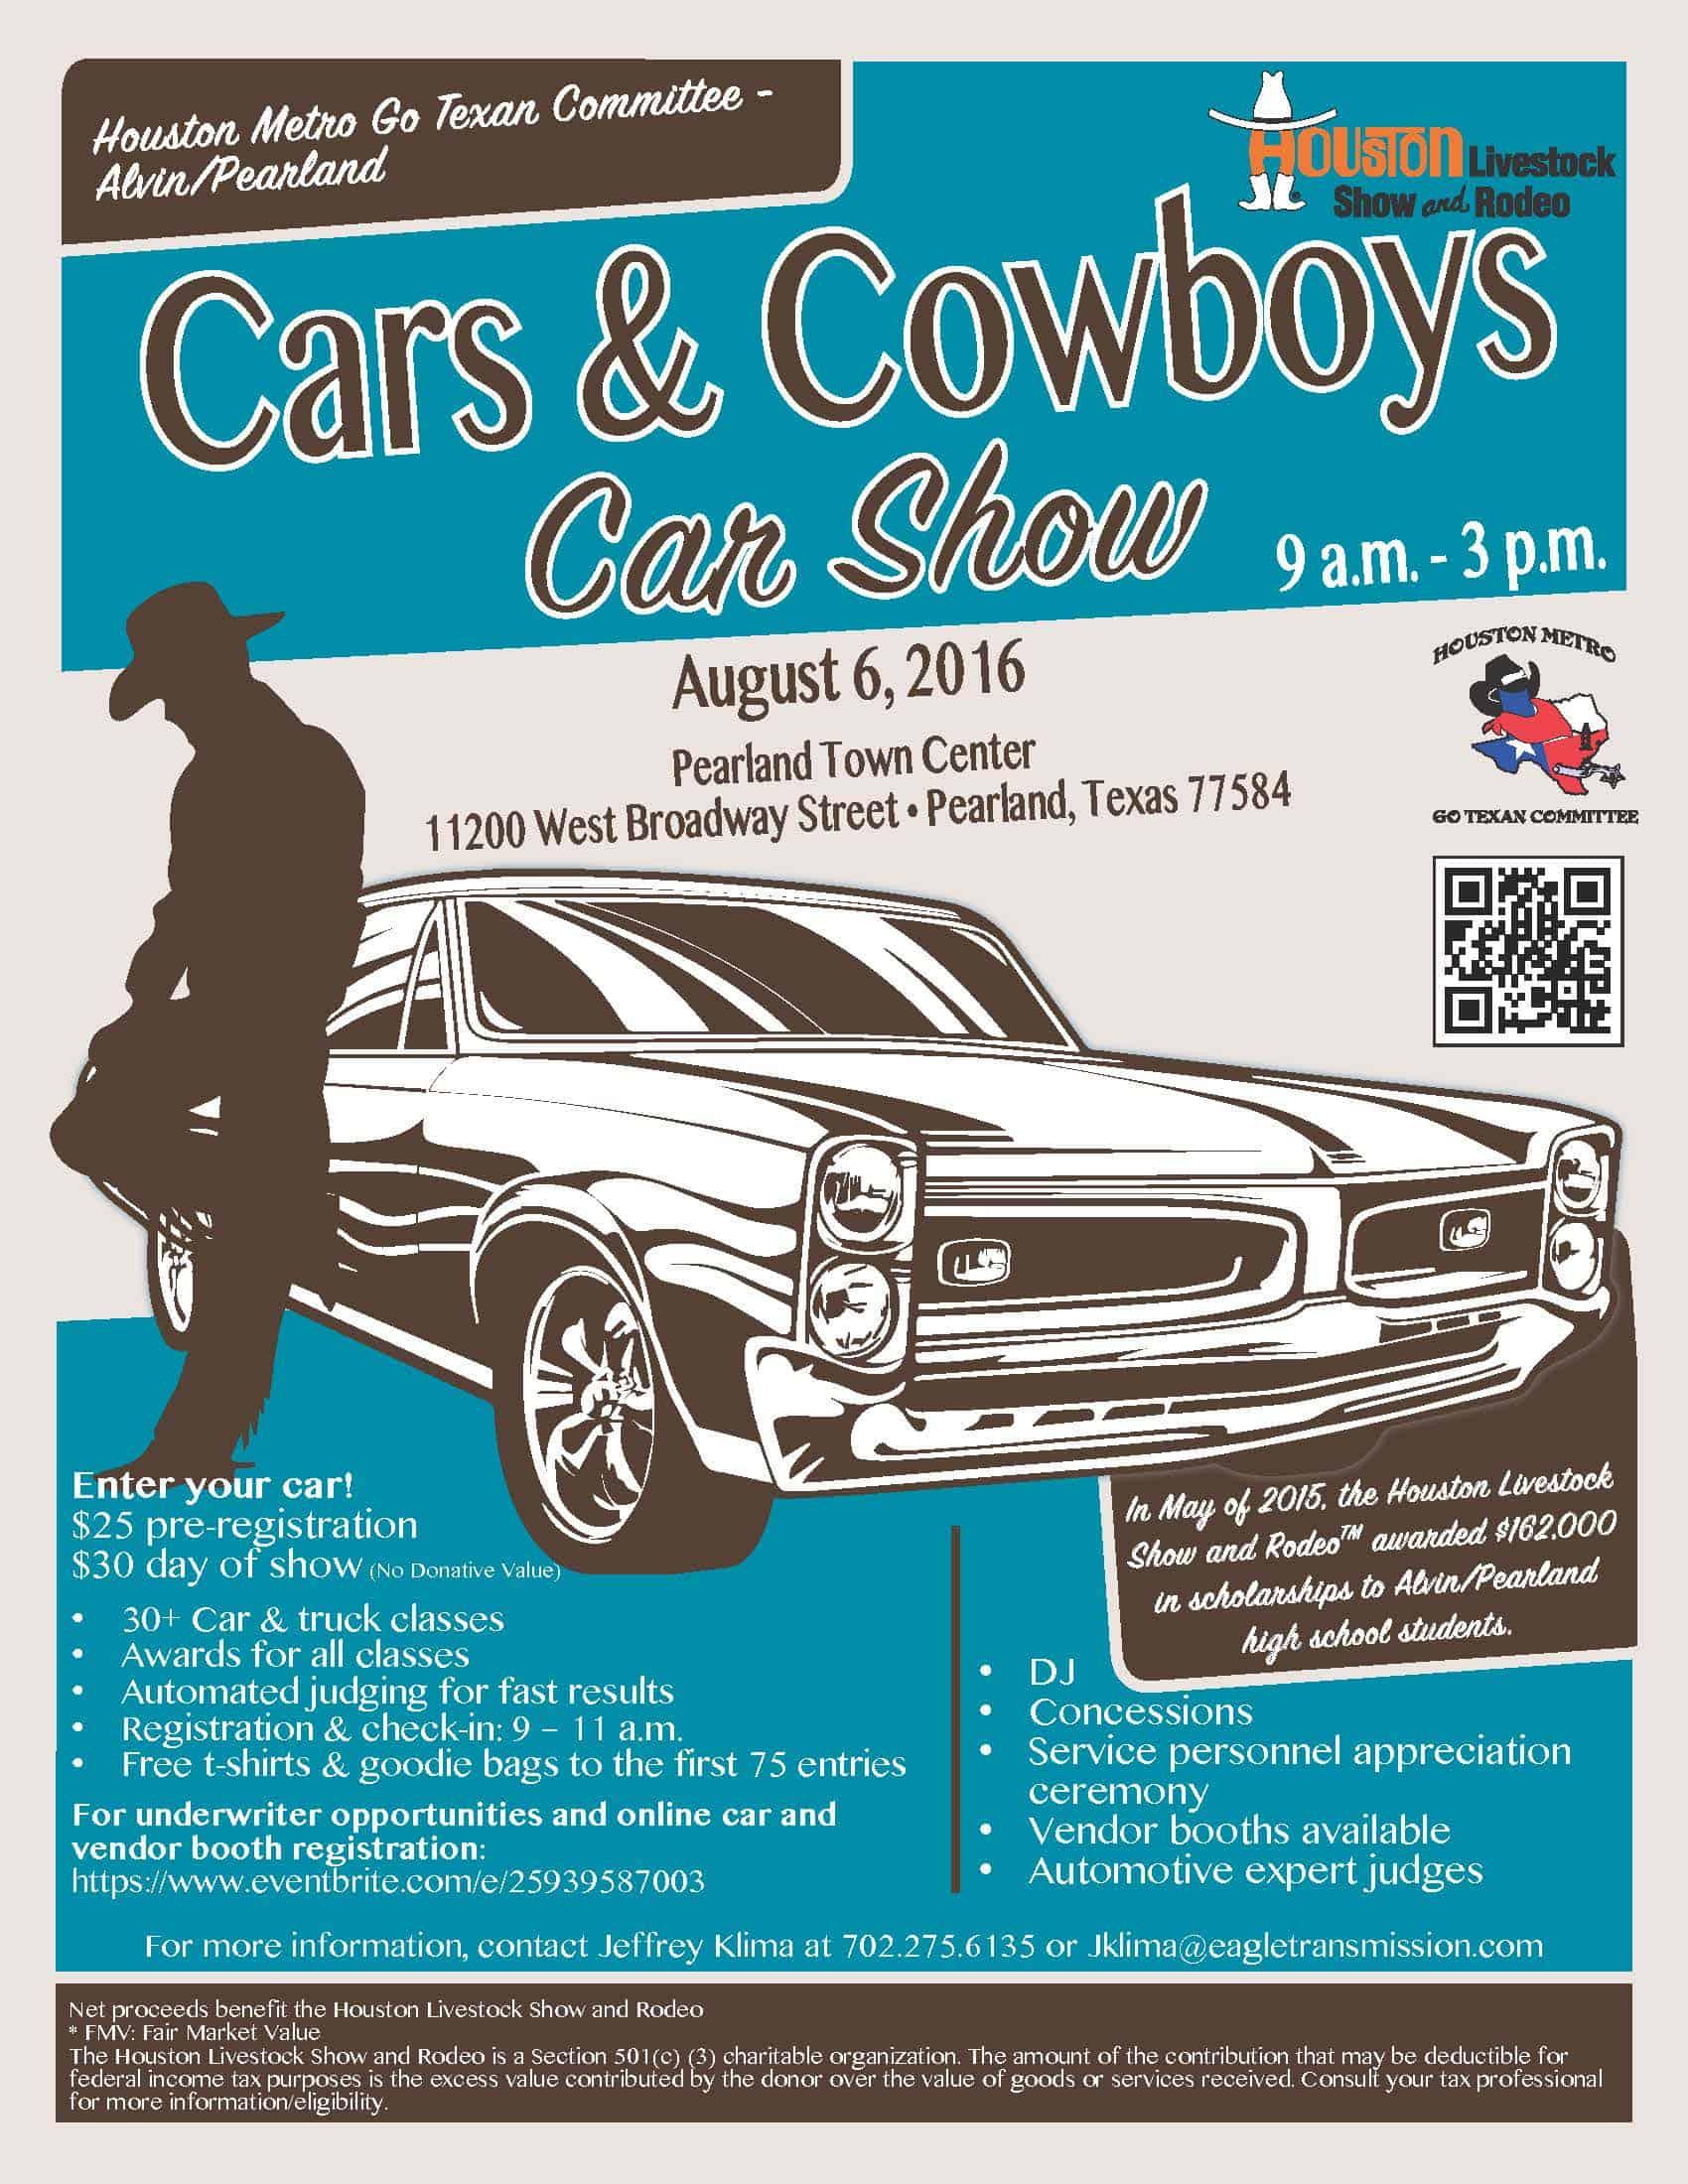 Houston Livestock Show Rodeo Presents Alvin Pearland Cars Cowboys Car